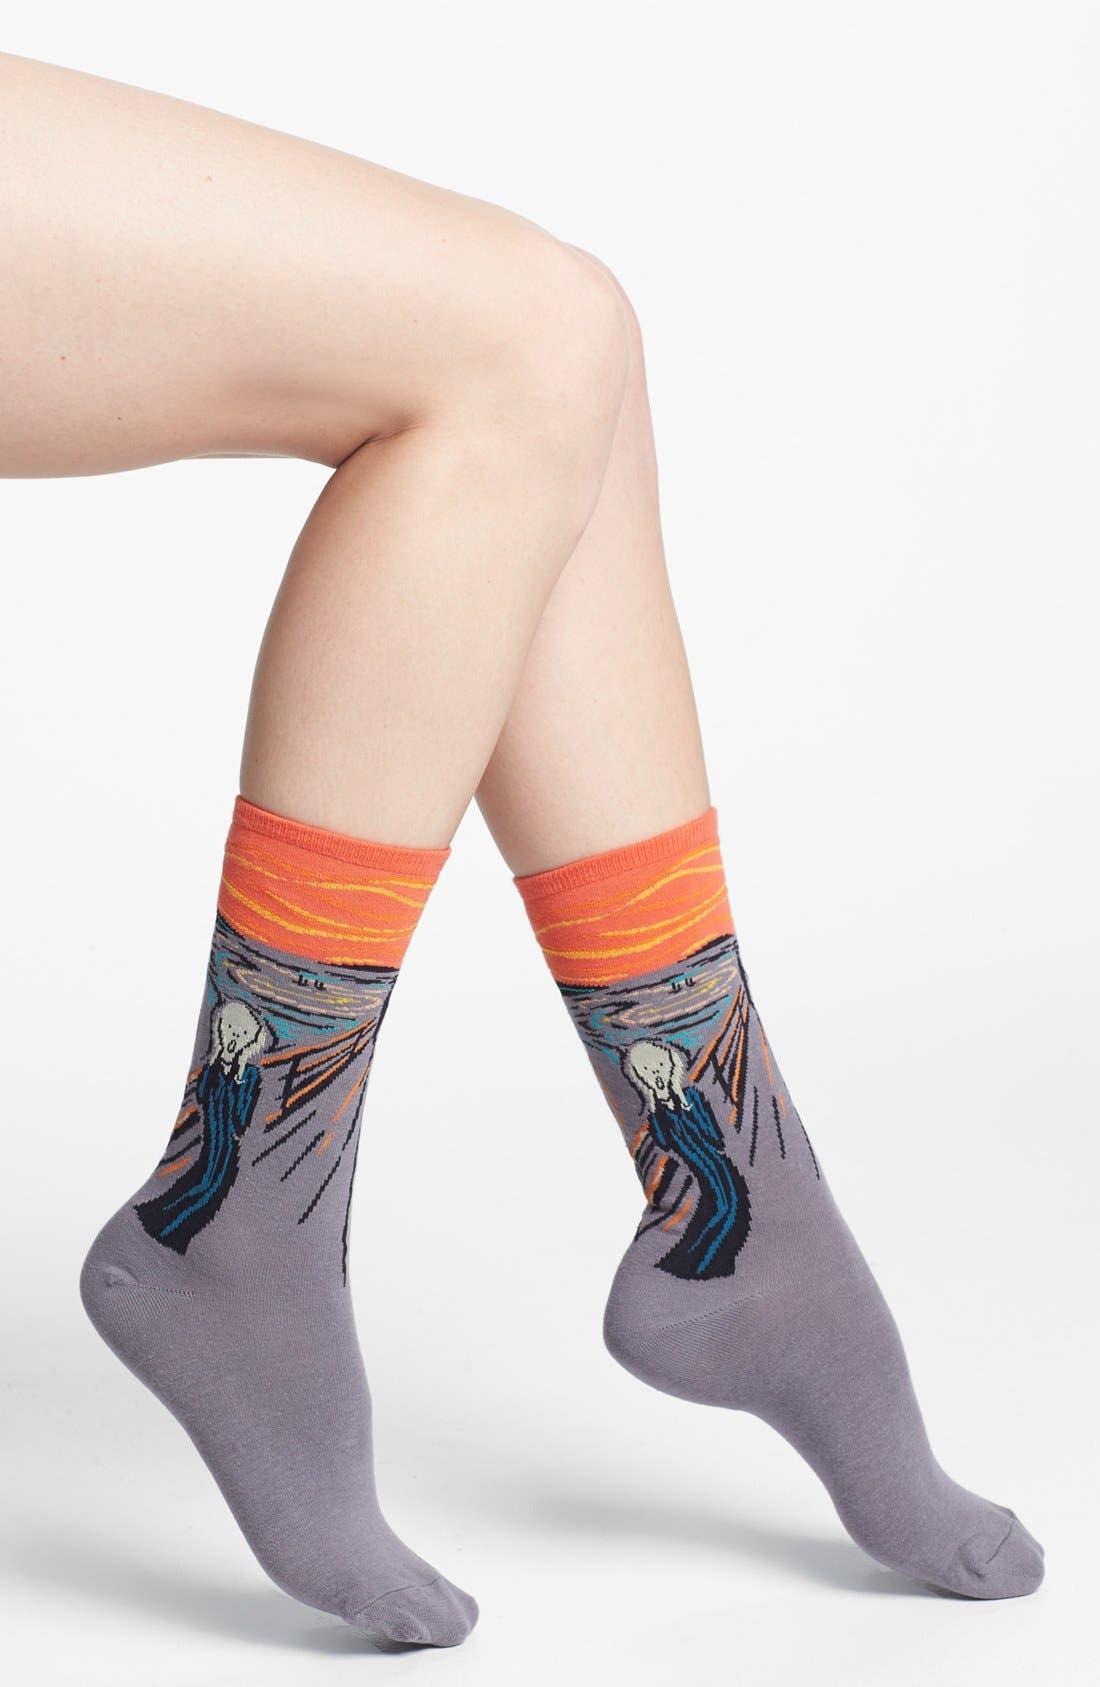 Alternate Image 1 Selected - Hot Sox 'Scream' Socks